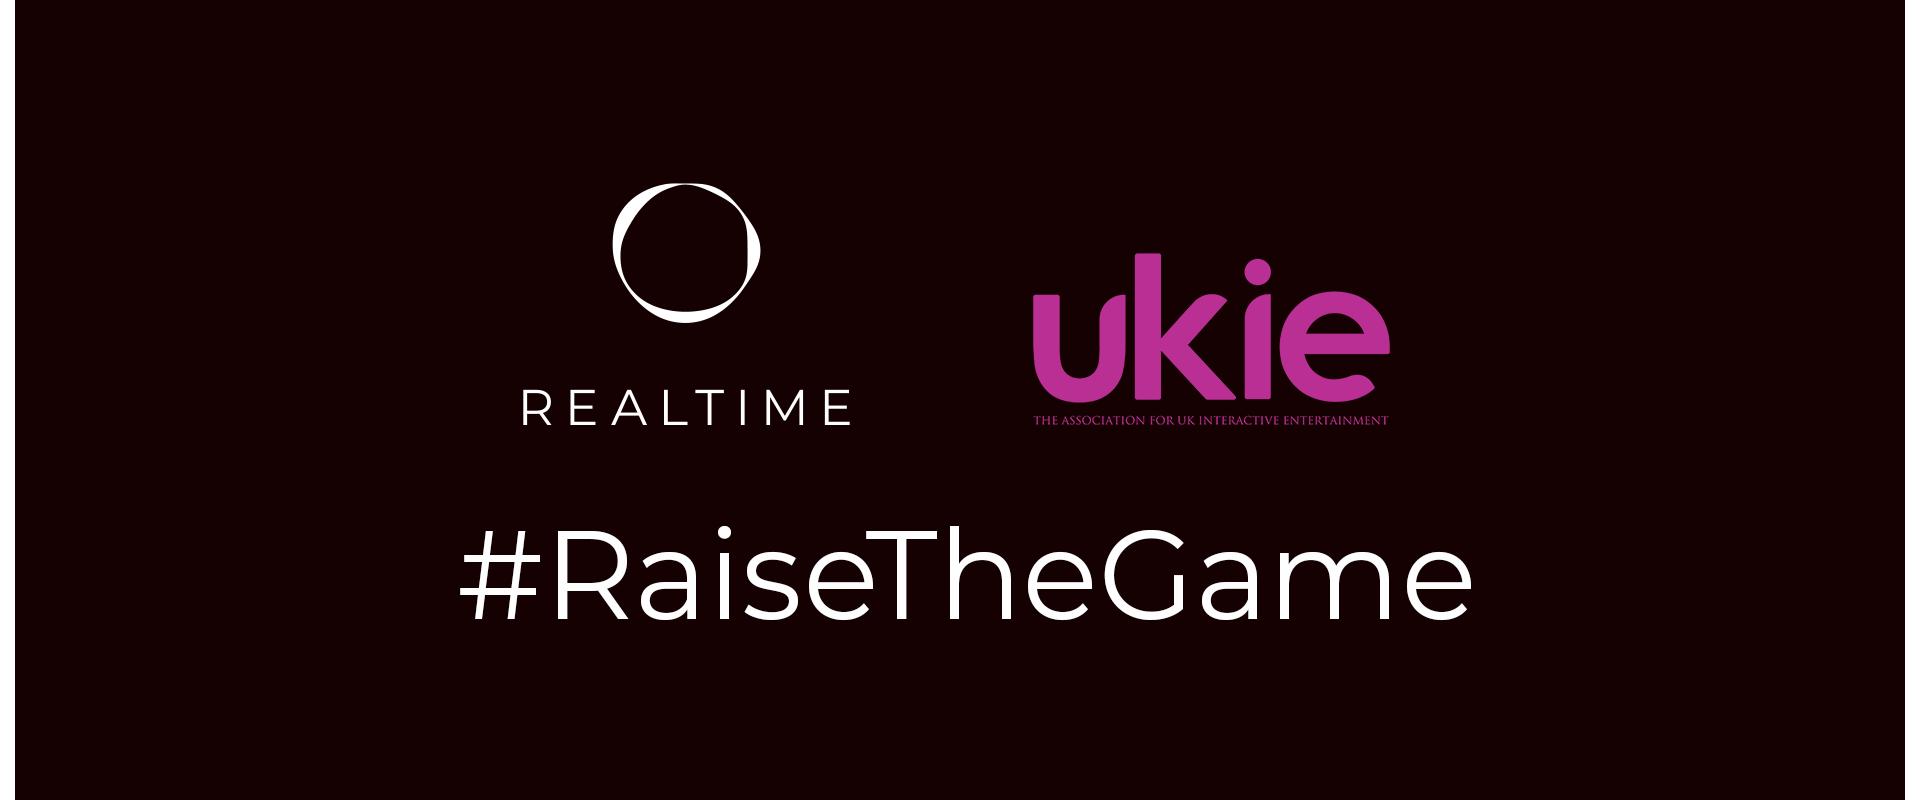 REALTIME team up with Ukie to #RaiseTheGame on diversity